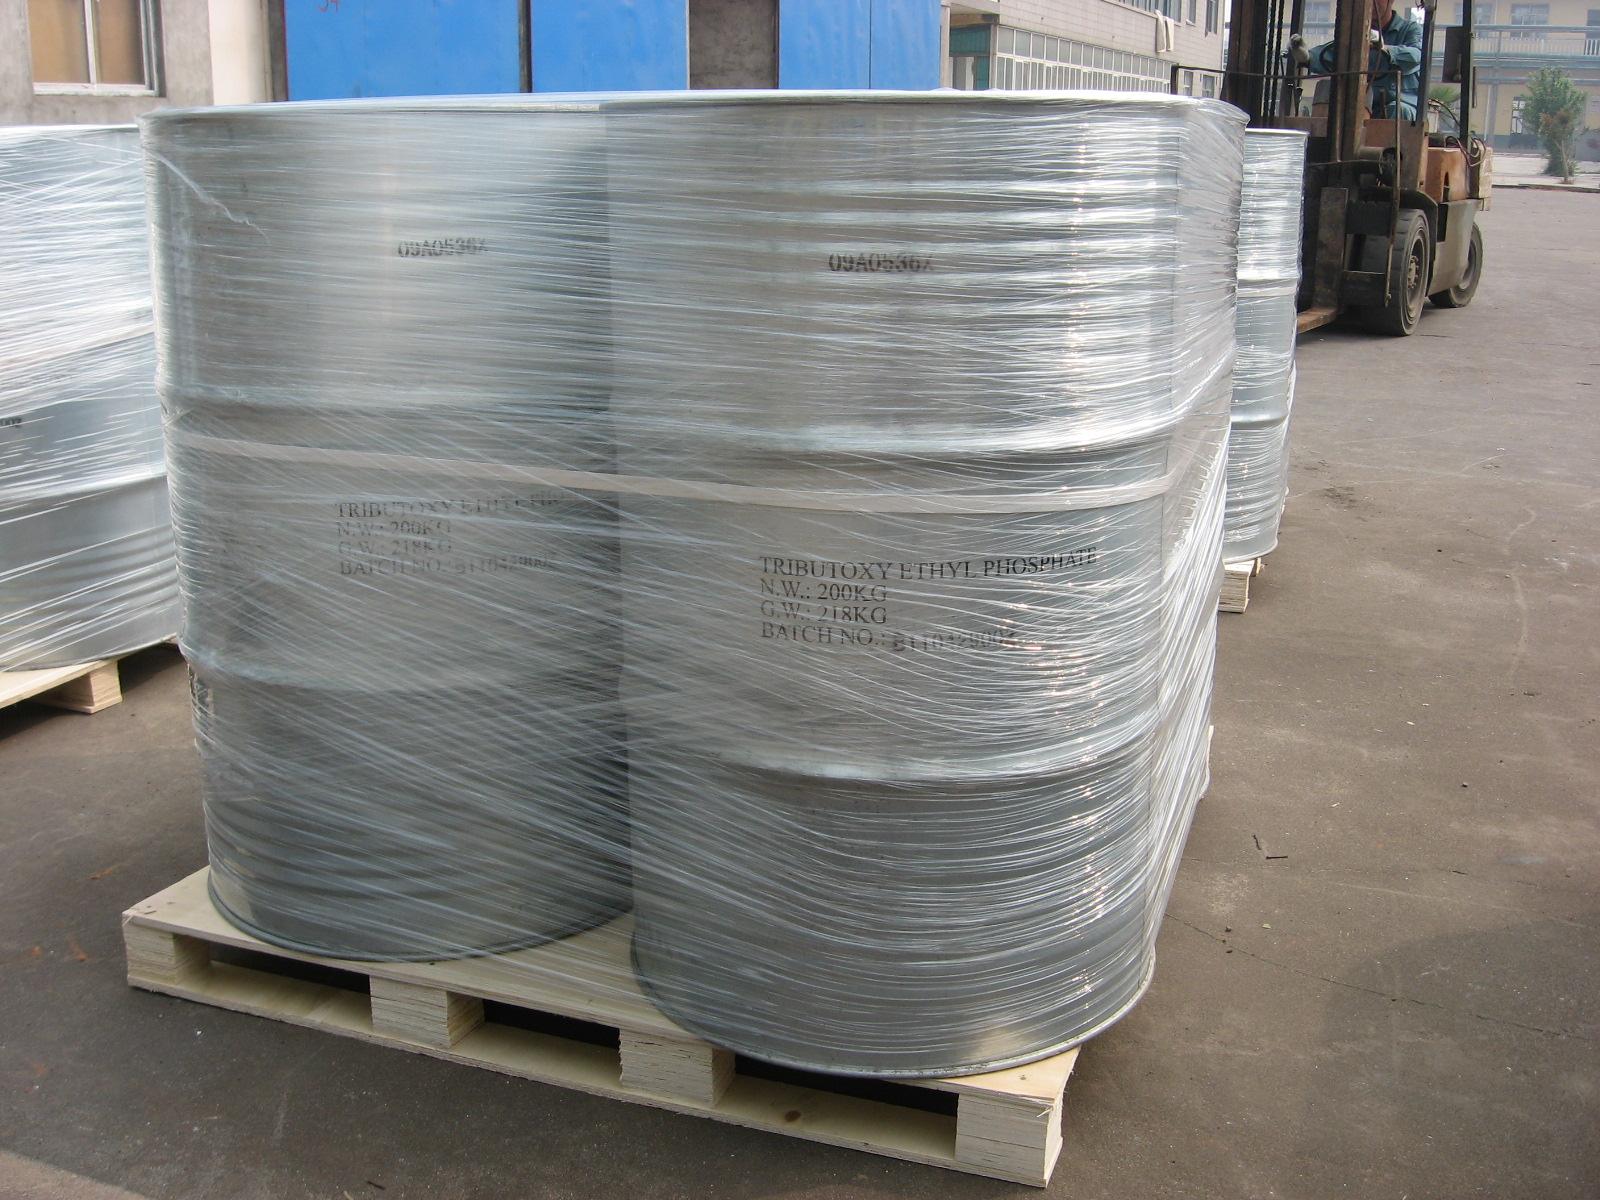 TrislajeTDicloro - 2 -propilo